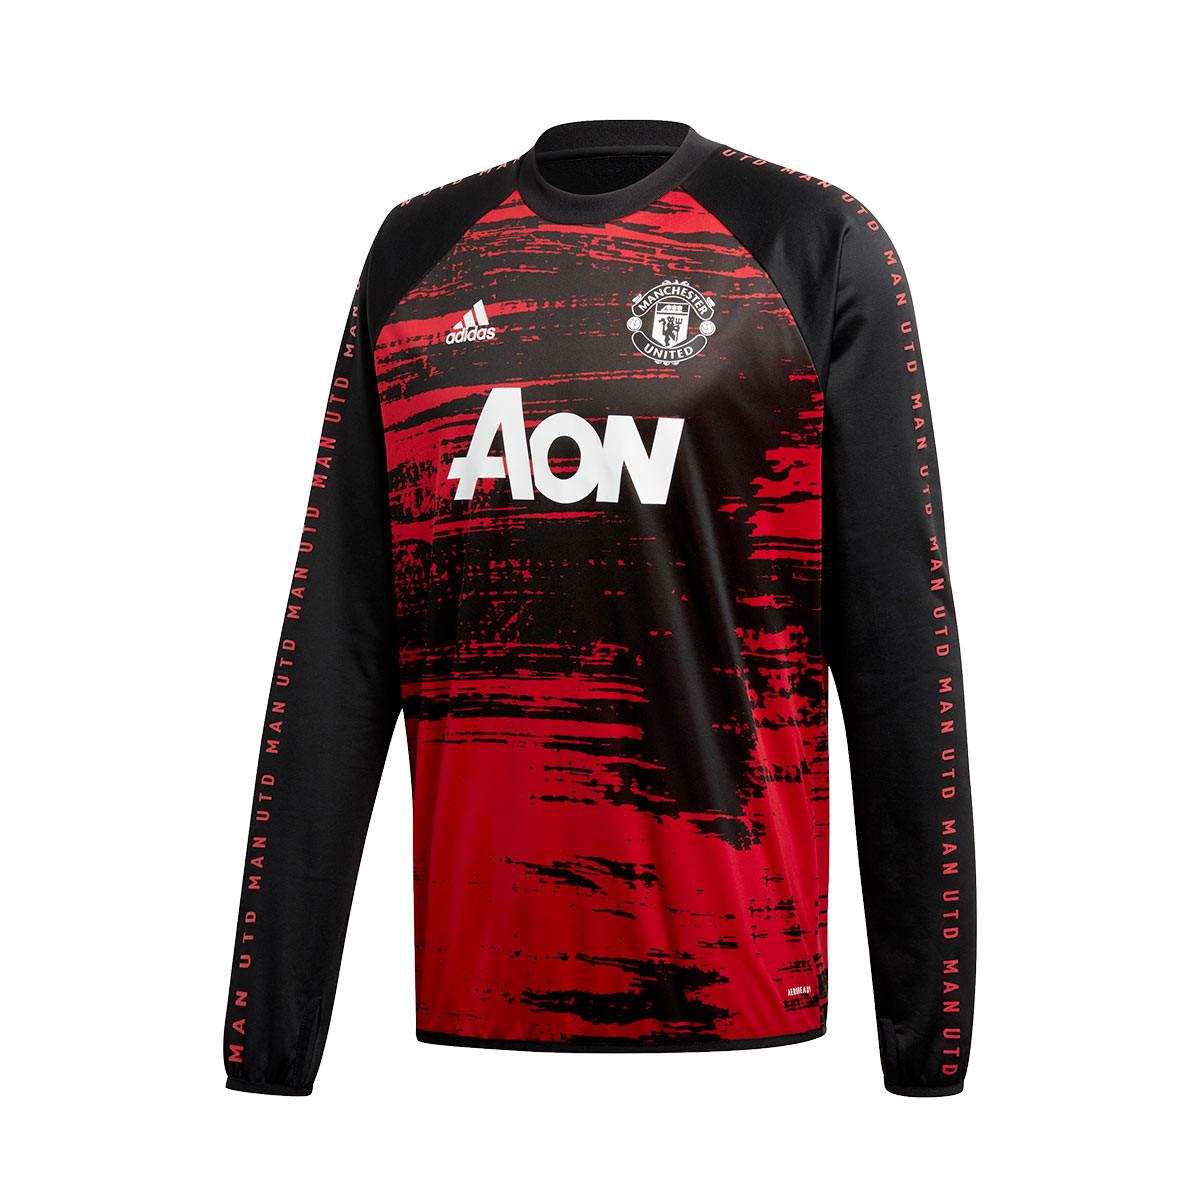 Sweatshirt Adidas Manchester United Fc Pre Match Warm Top 2020 2021 Real Red Black Football Store Futbol Emotion